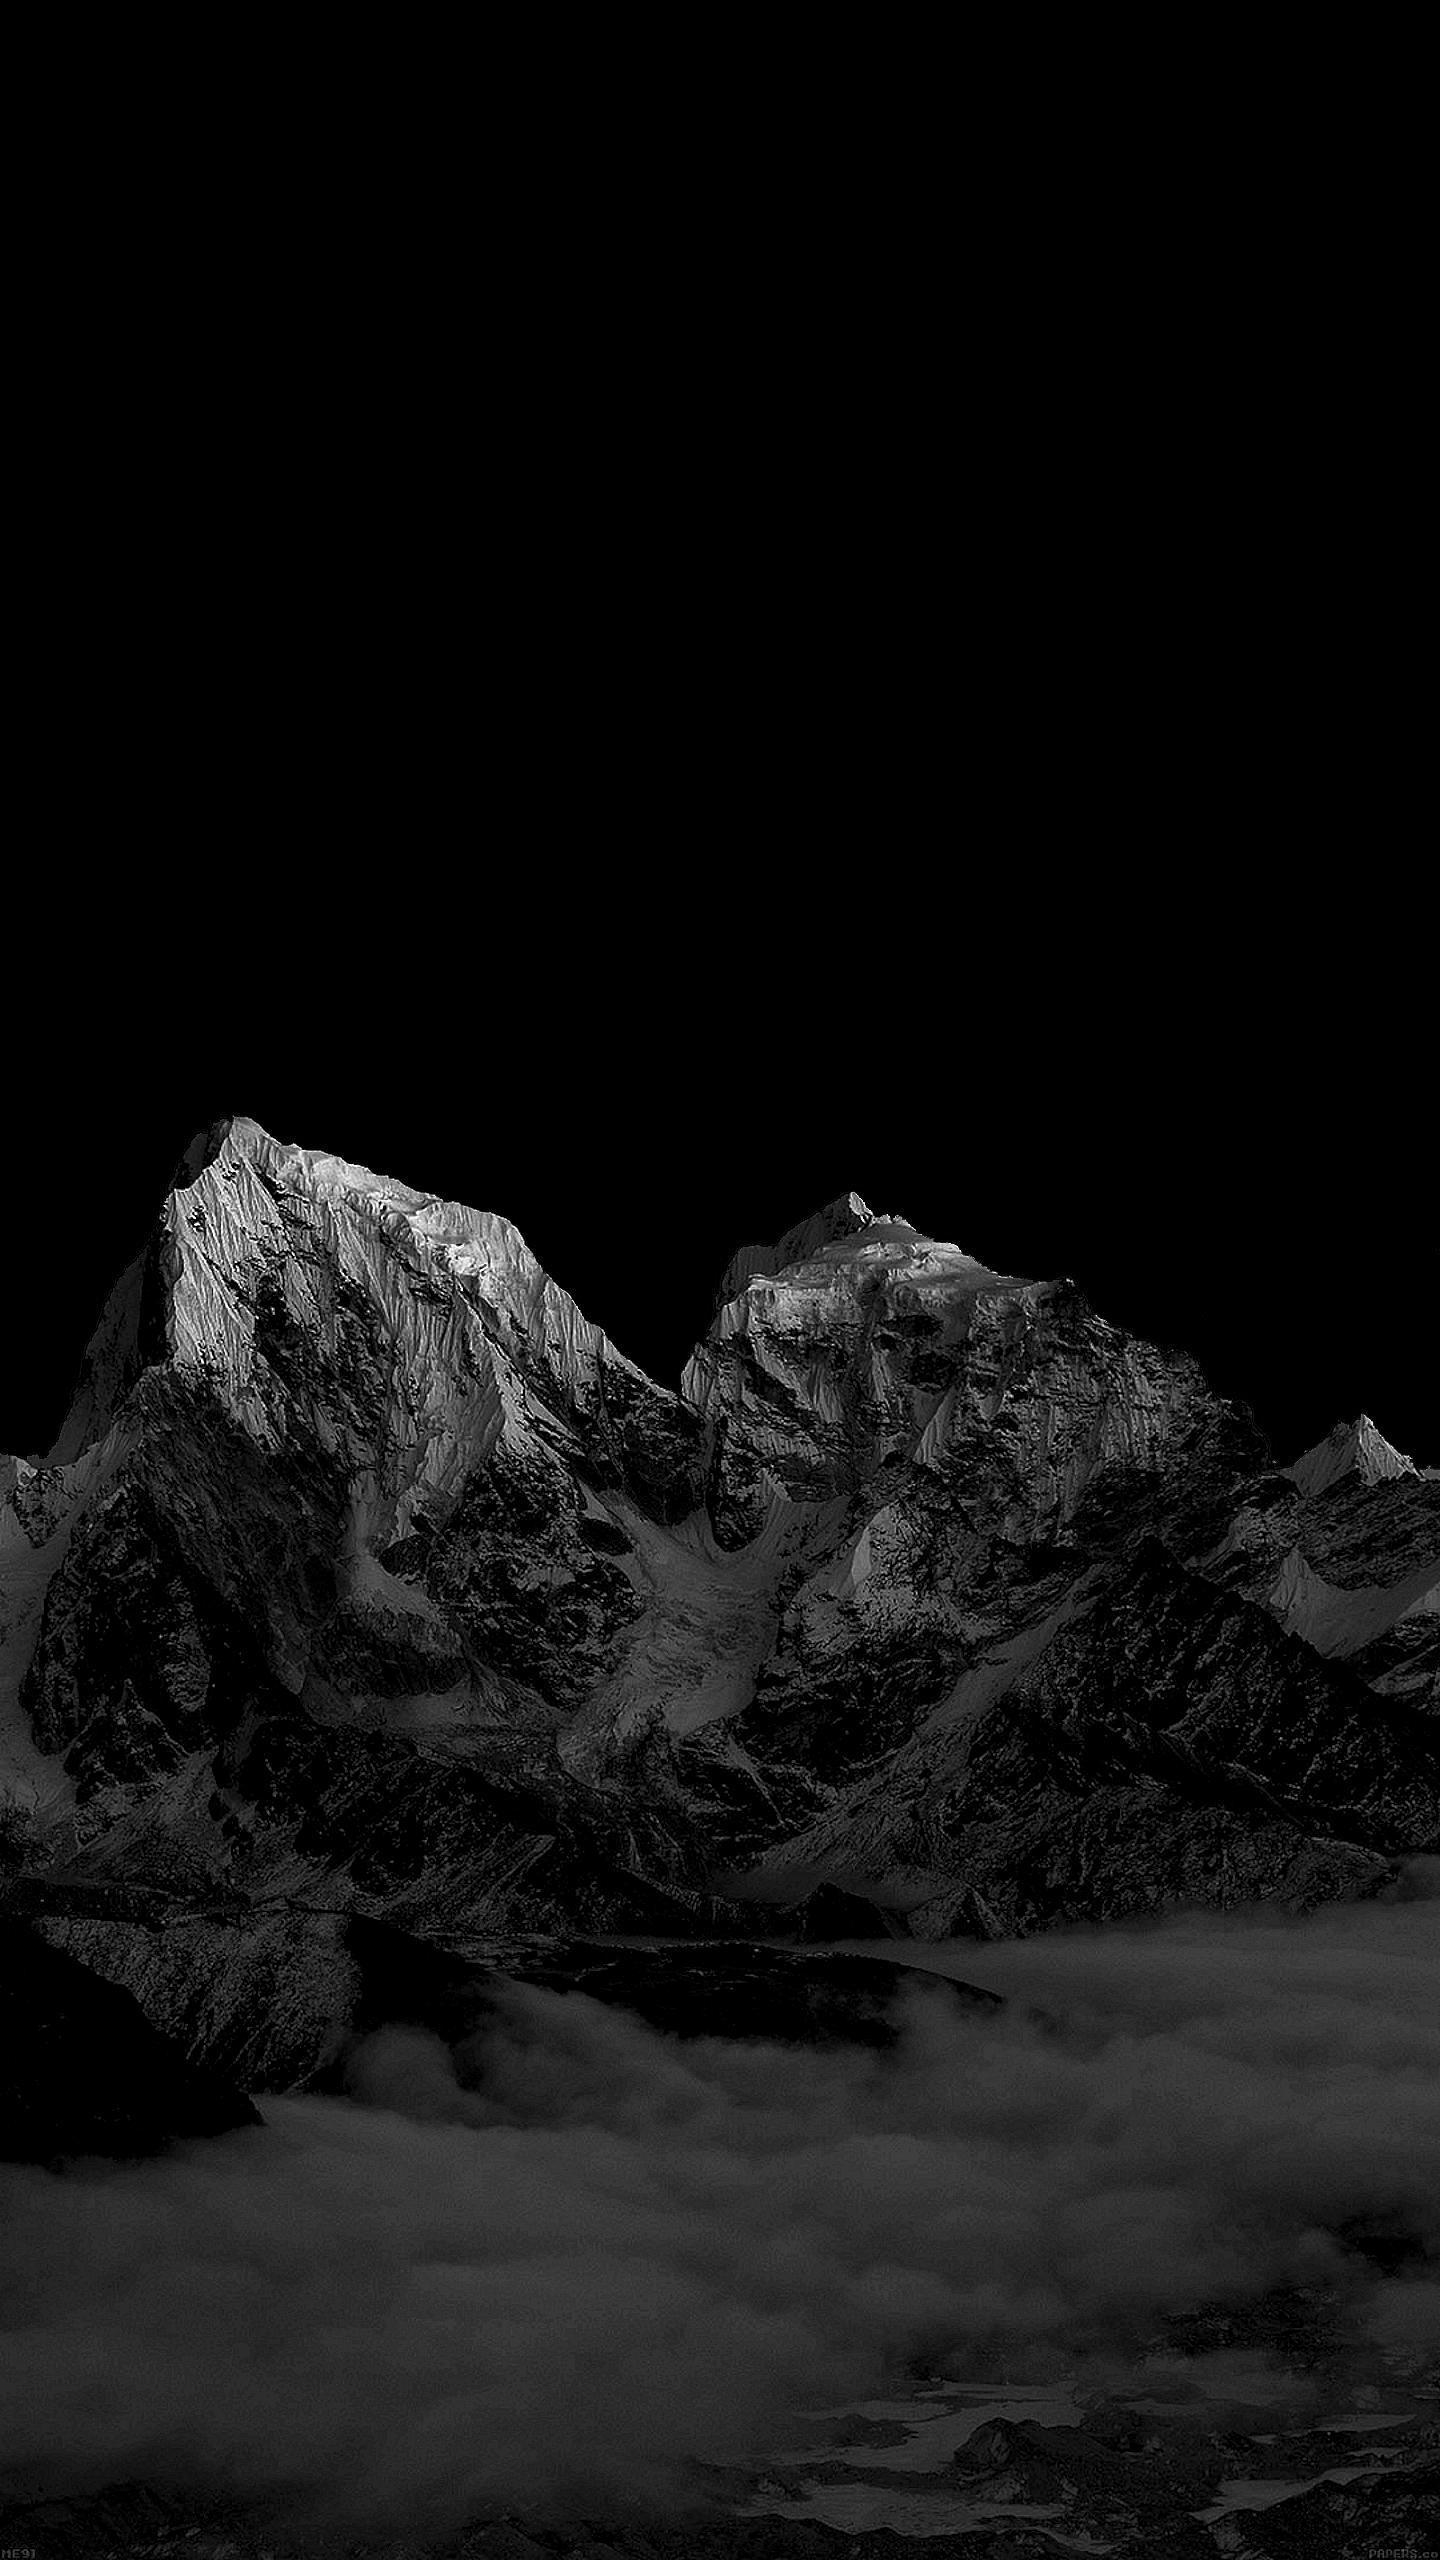 iPhone 12 4k Wallpapers - Wallpaper Cave